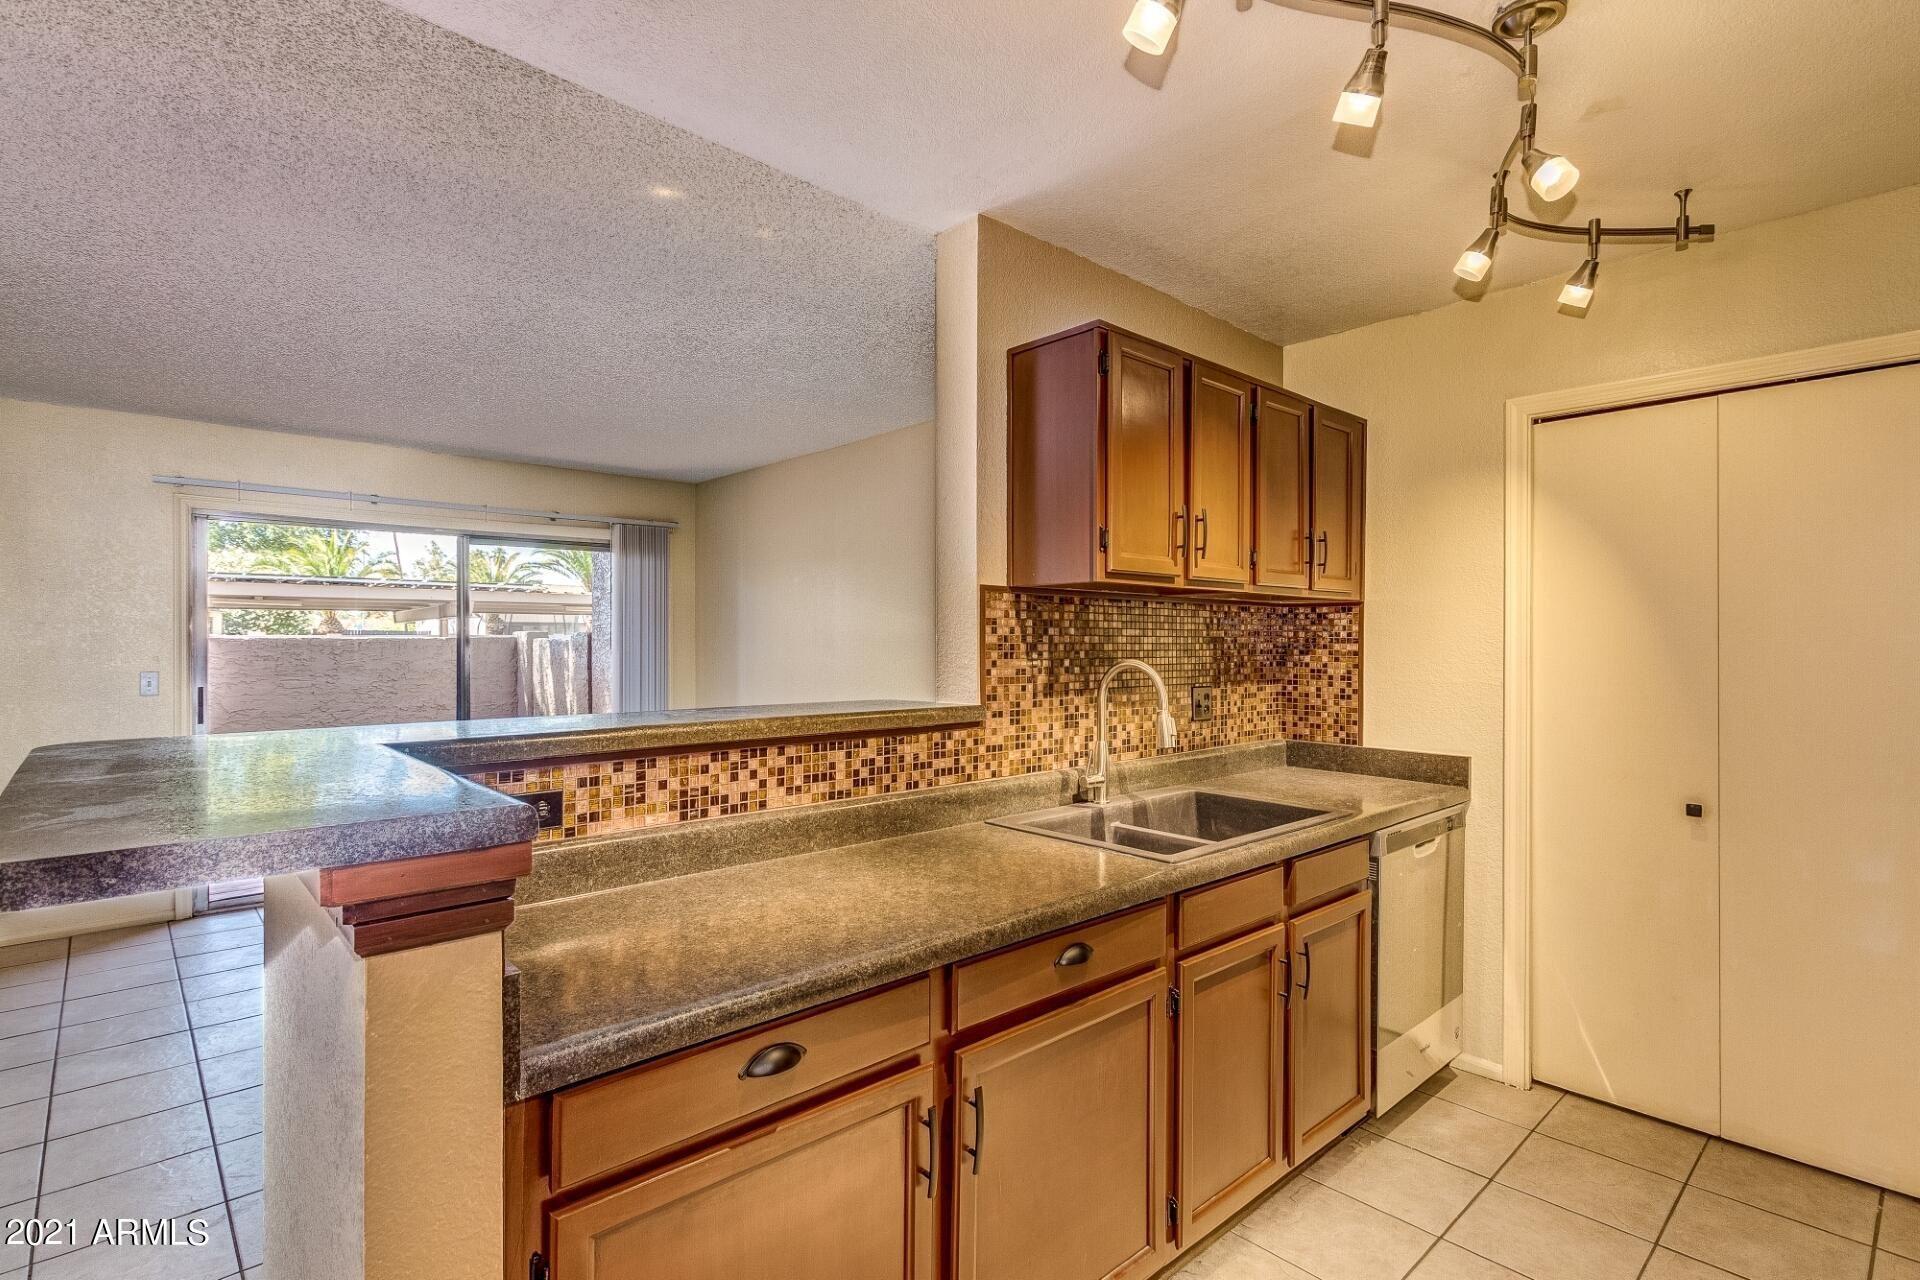 Photo of 623 W GUADALUPE Road #160, Mesa, AZ 85210 (MLS # 6249966)